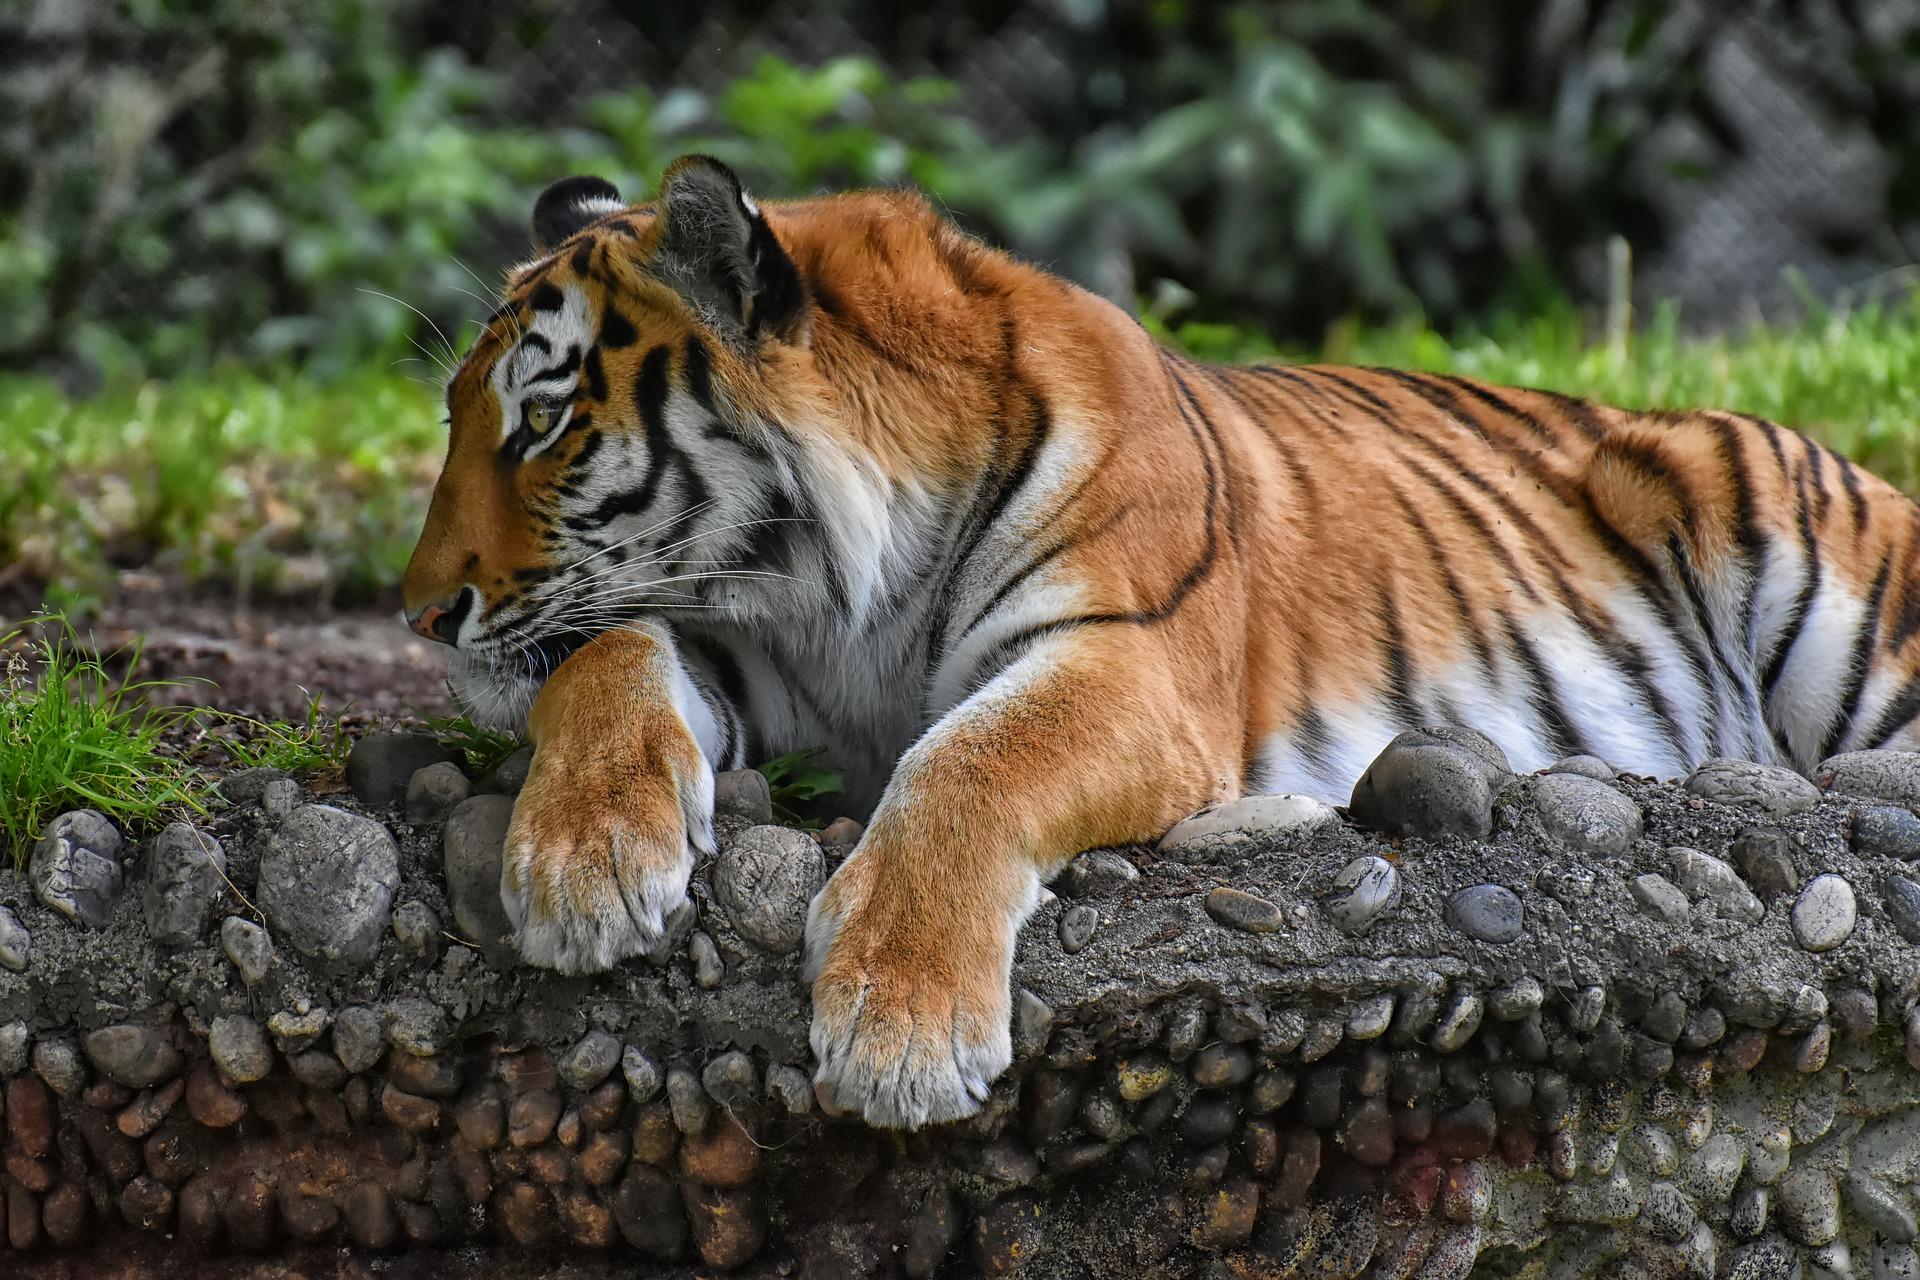 Tiger Stripe Patterns Are As Unique As A Human Fingerprint